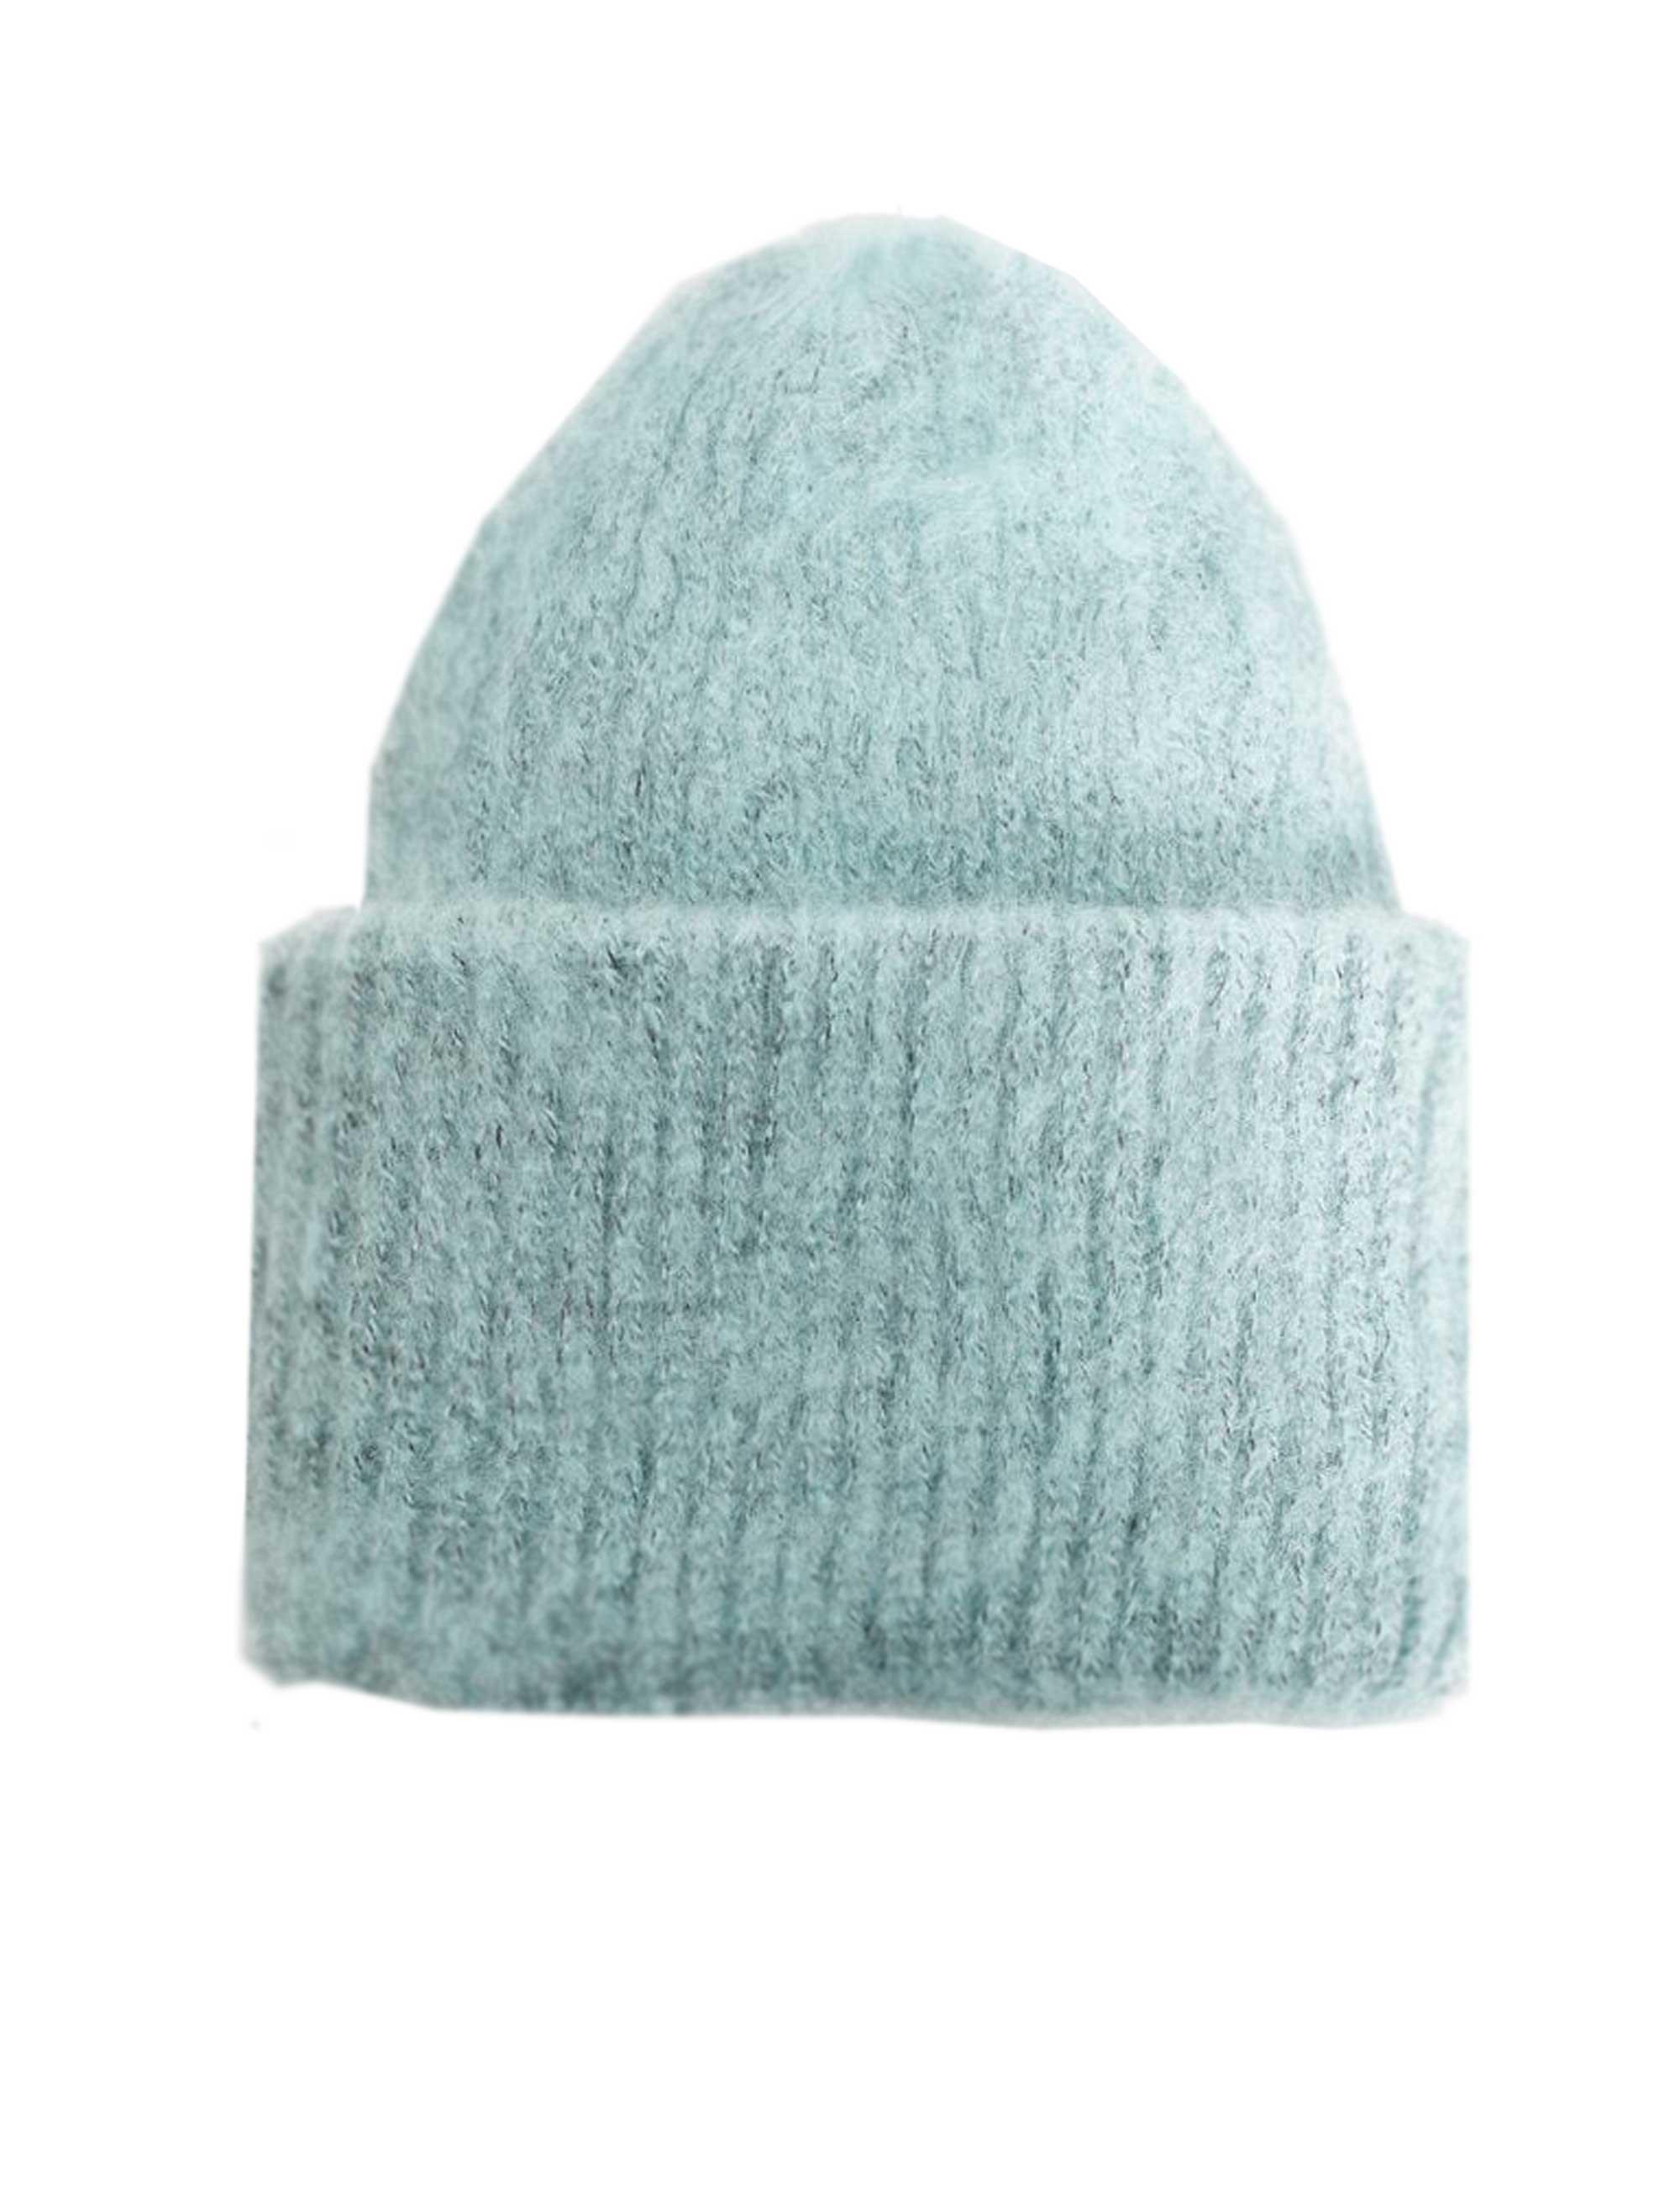 کلاه بافتنی زنانه - مانگو - سبز آبي روشن - 1